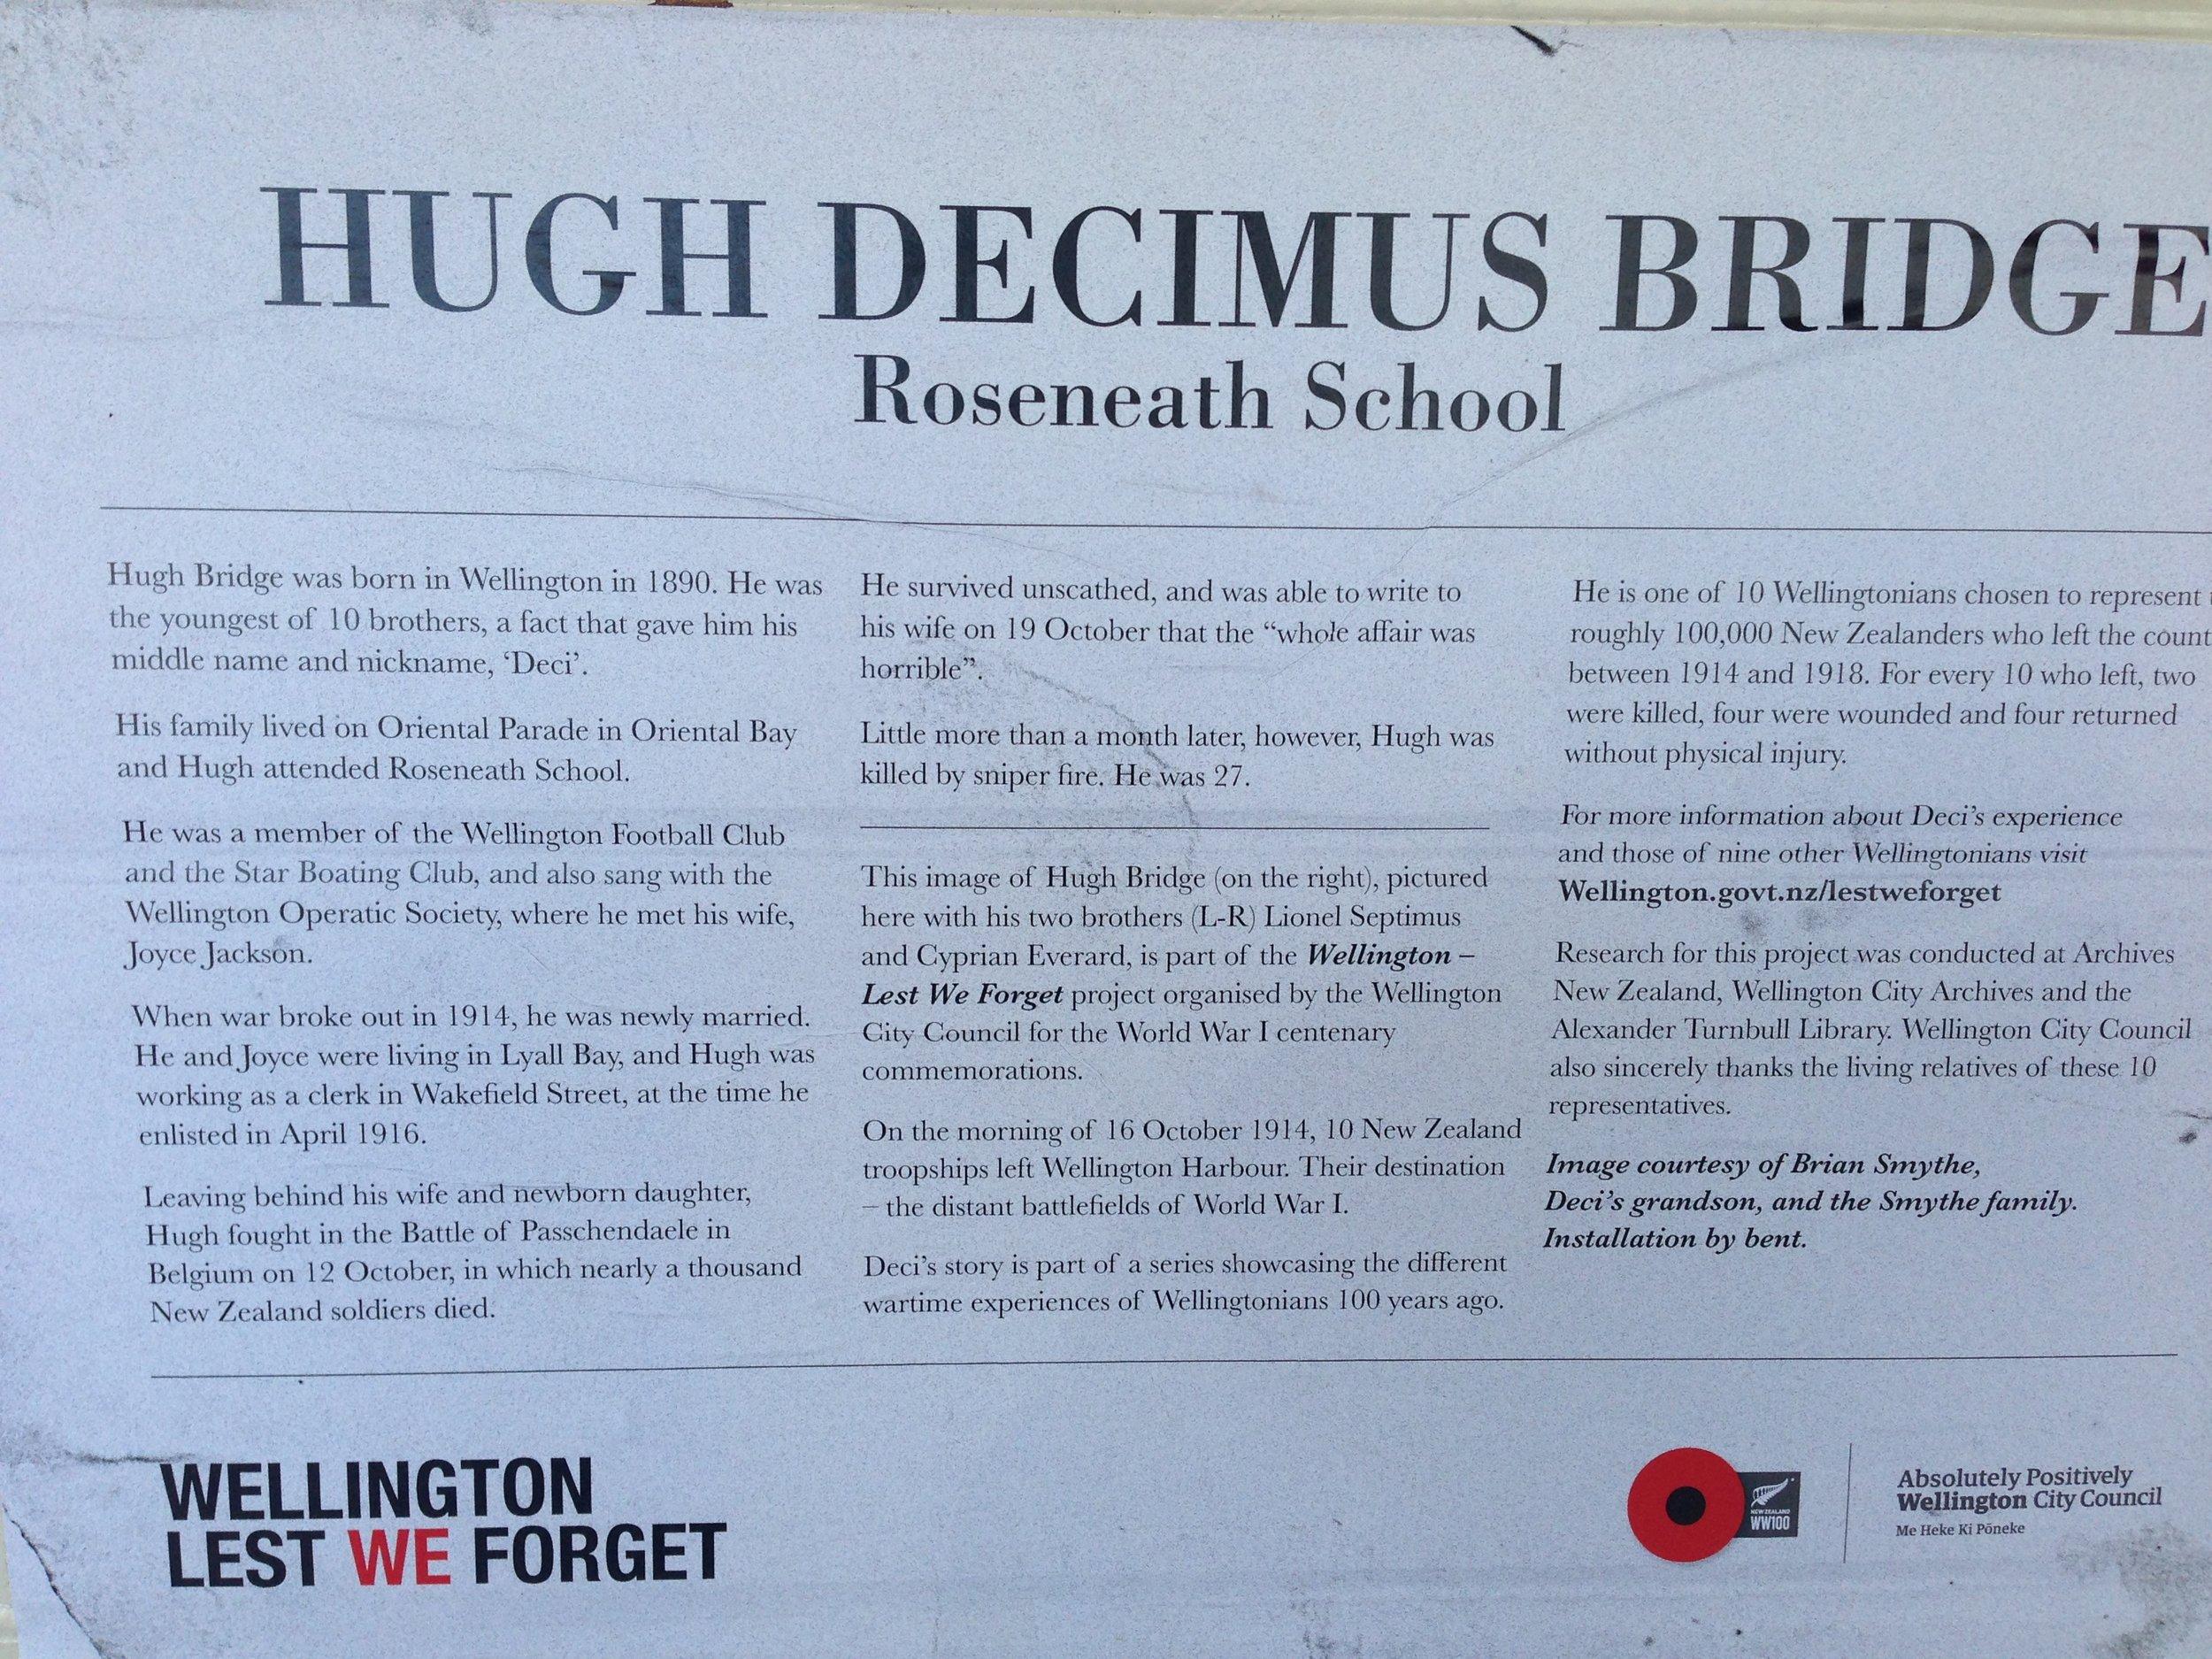 Information about Hugh (Decimus) Bridge